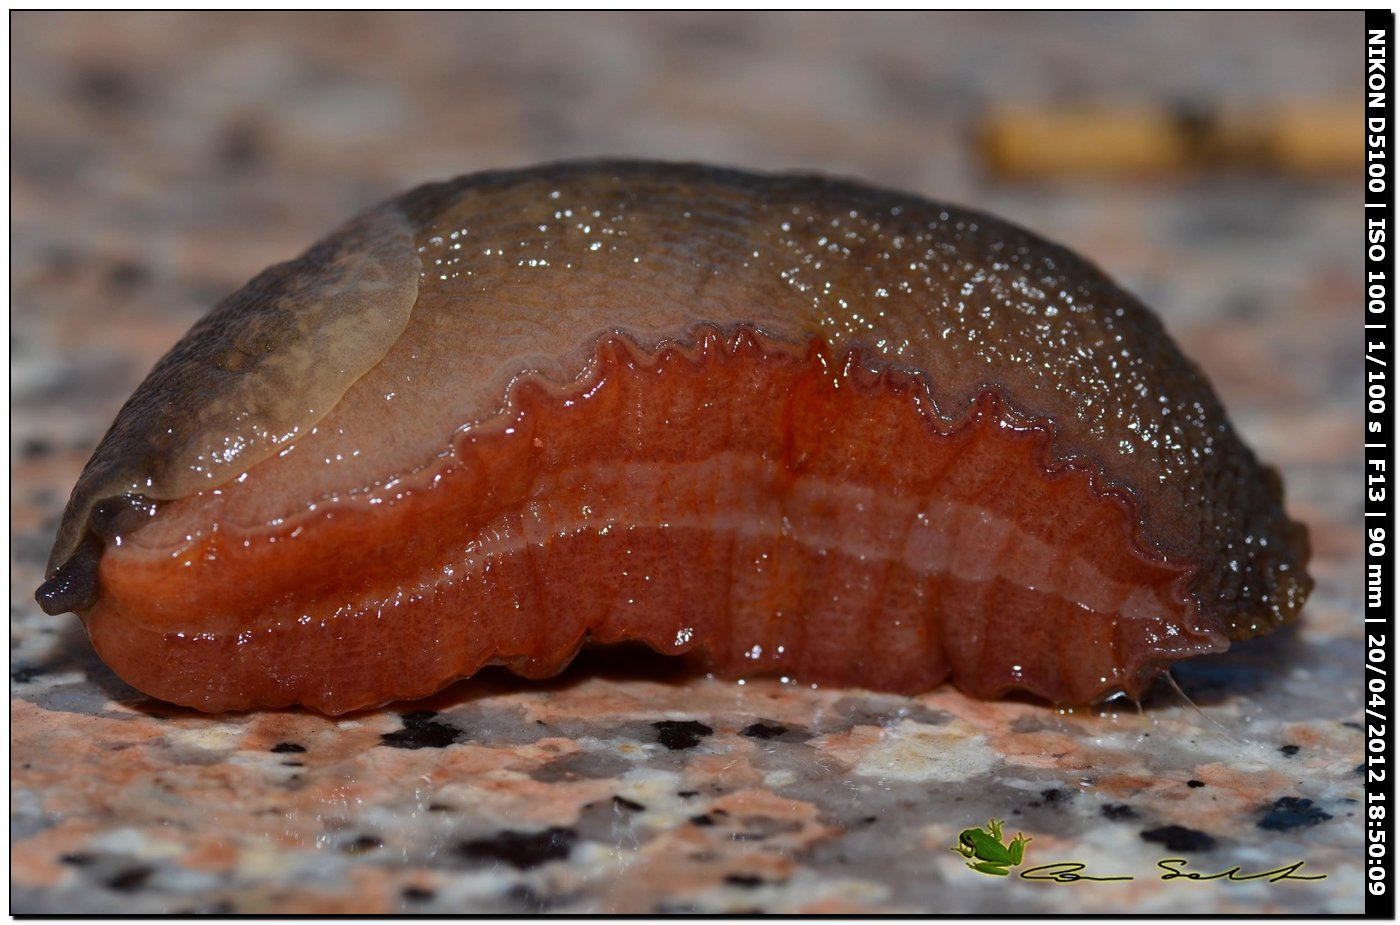 Limax del corsicus-gruppo da Ittiri/Sardegna